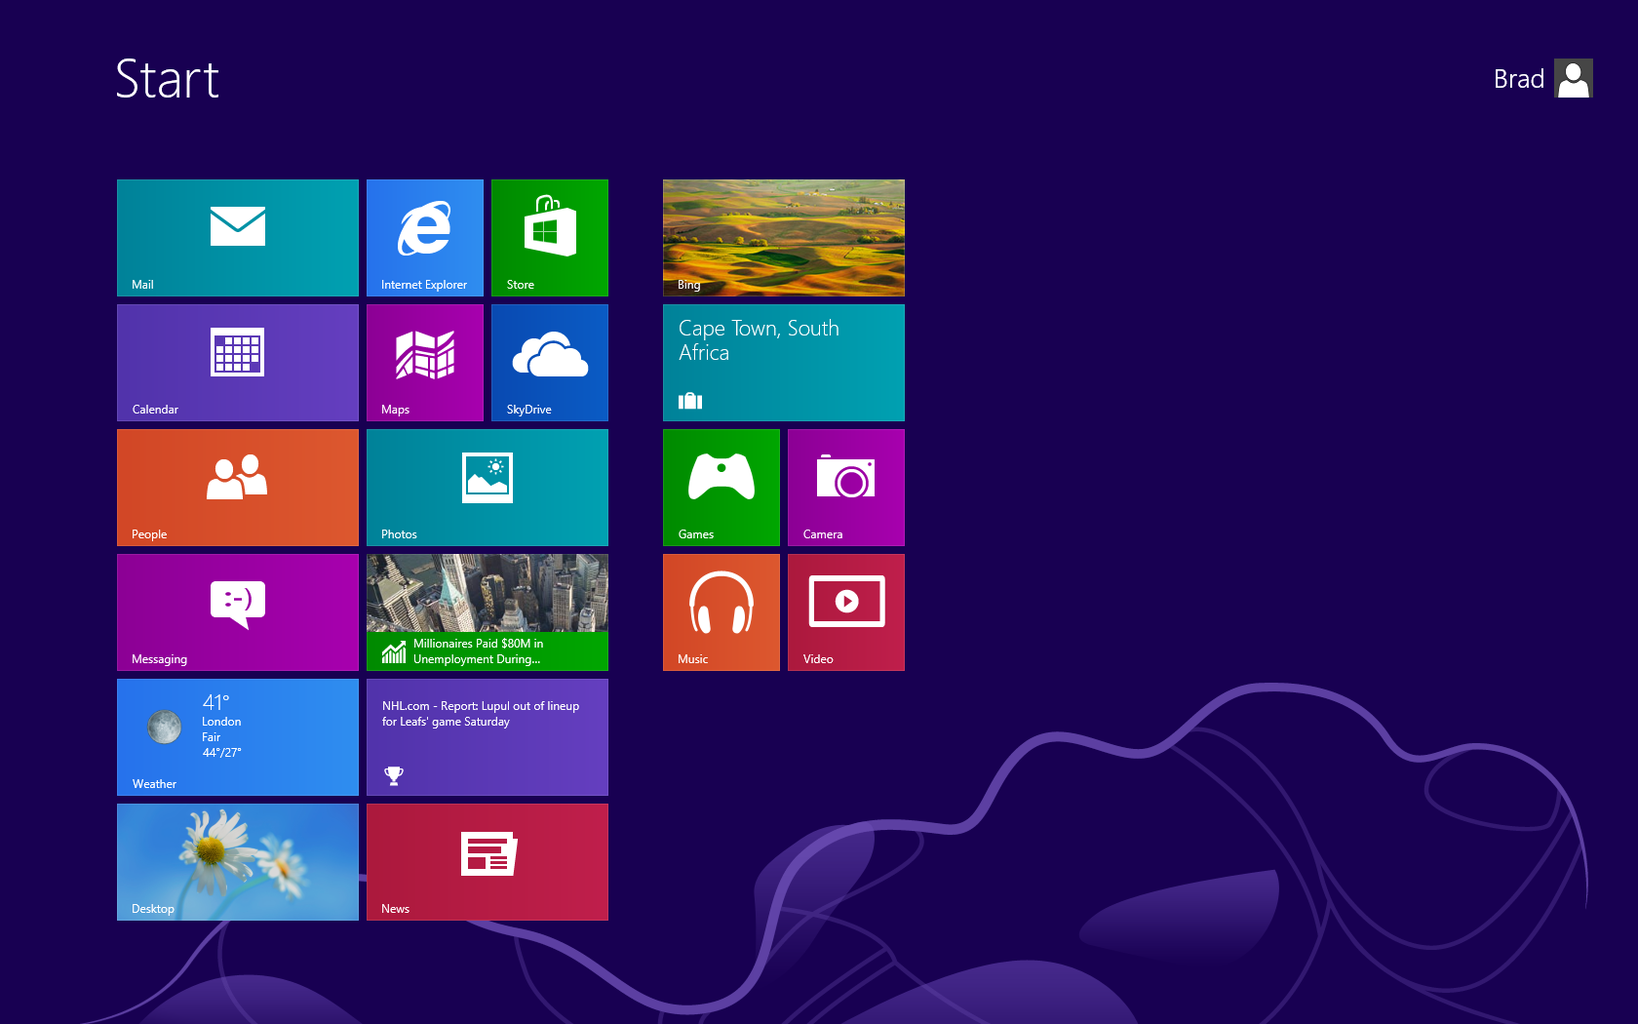 Upgrading and Using Windows 8!